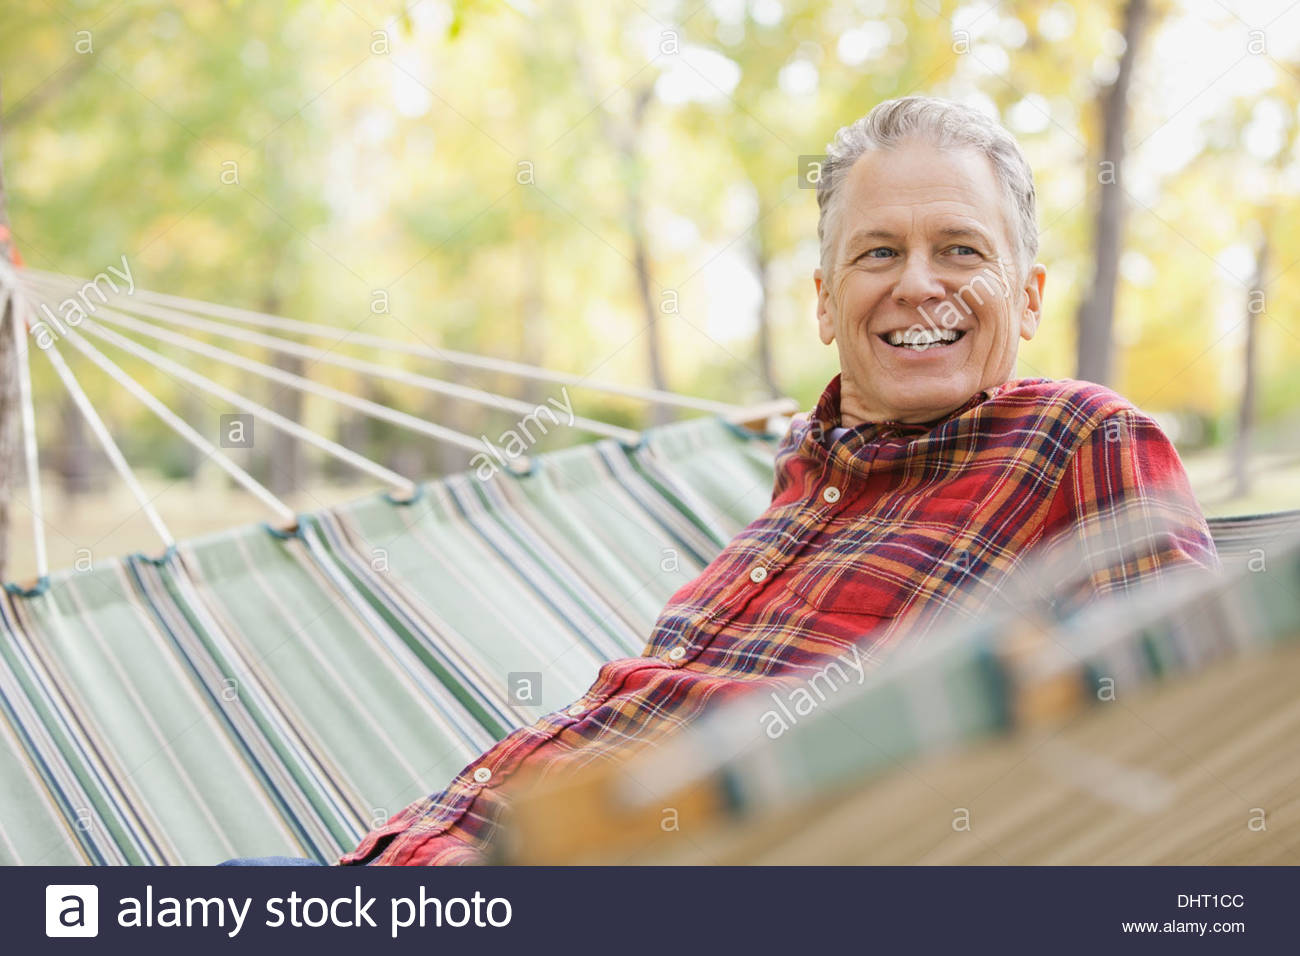 Senior man sitting in hammock at park Photo Stock